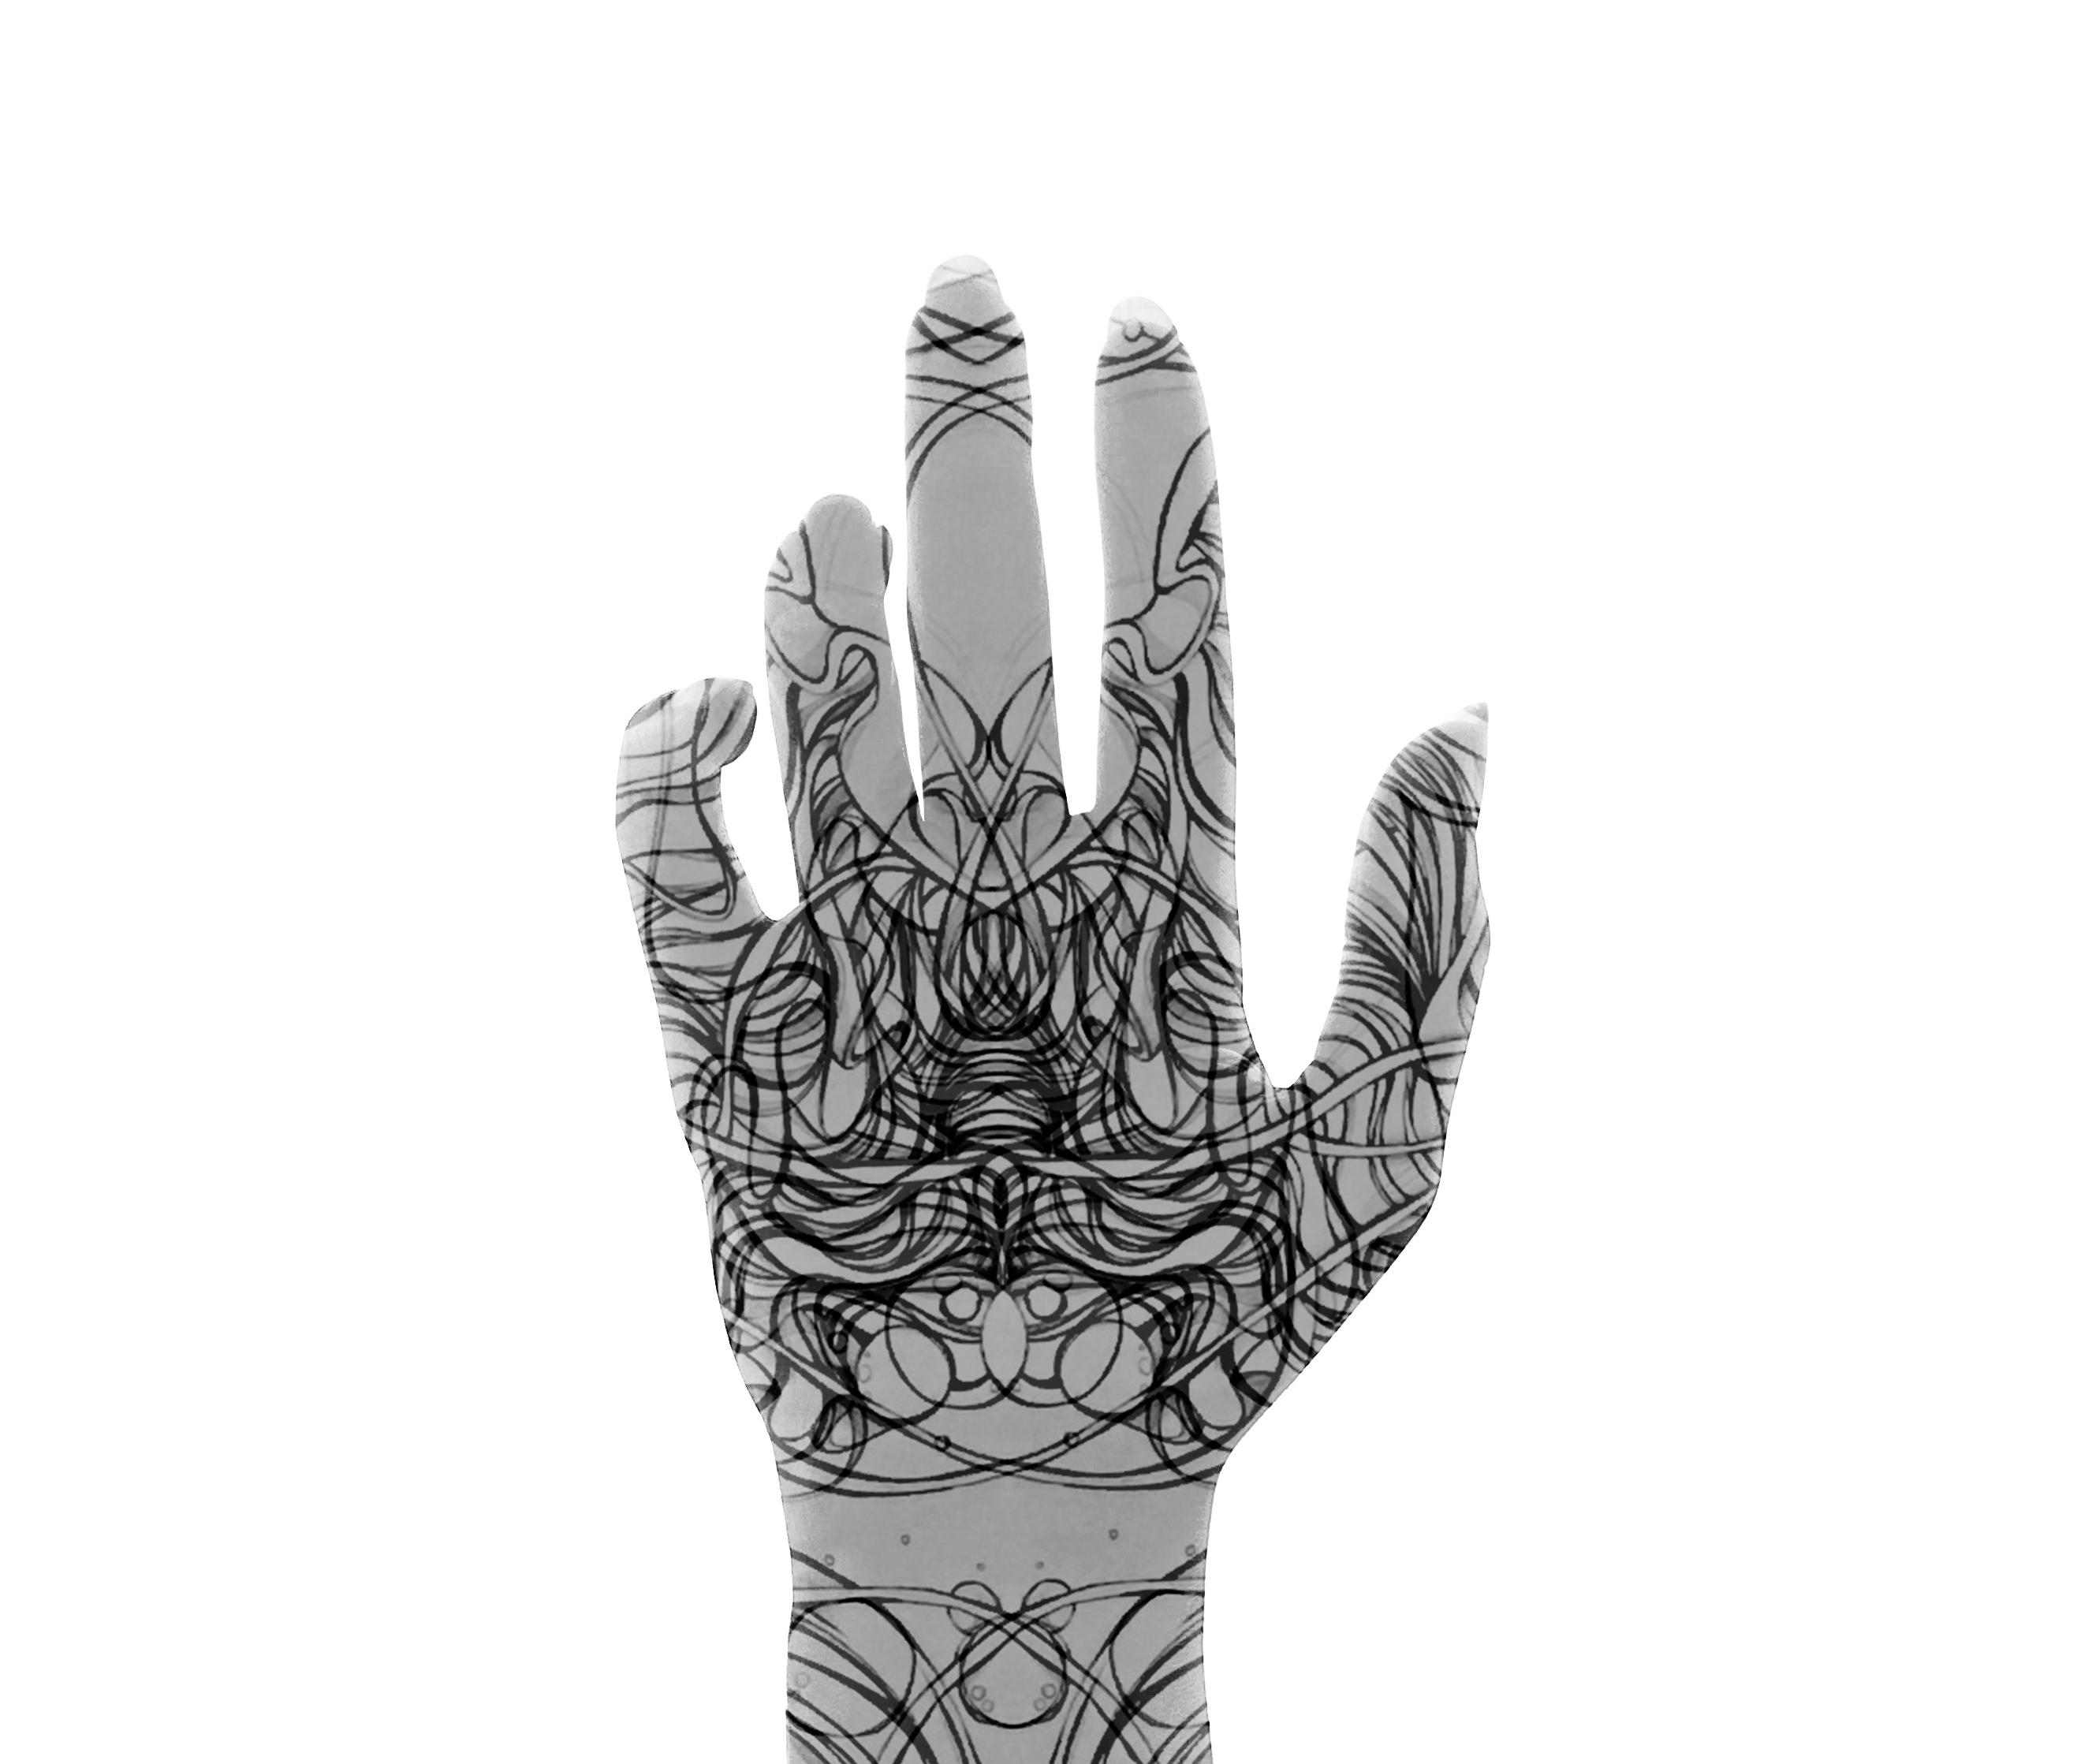 Sumaia's hand